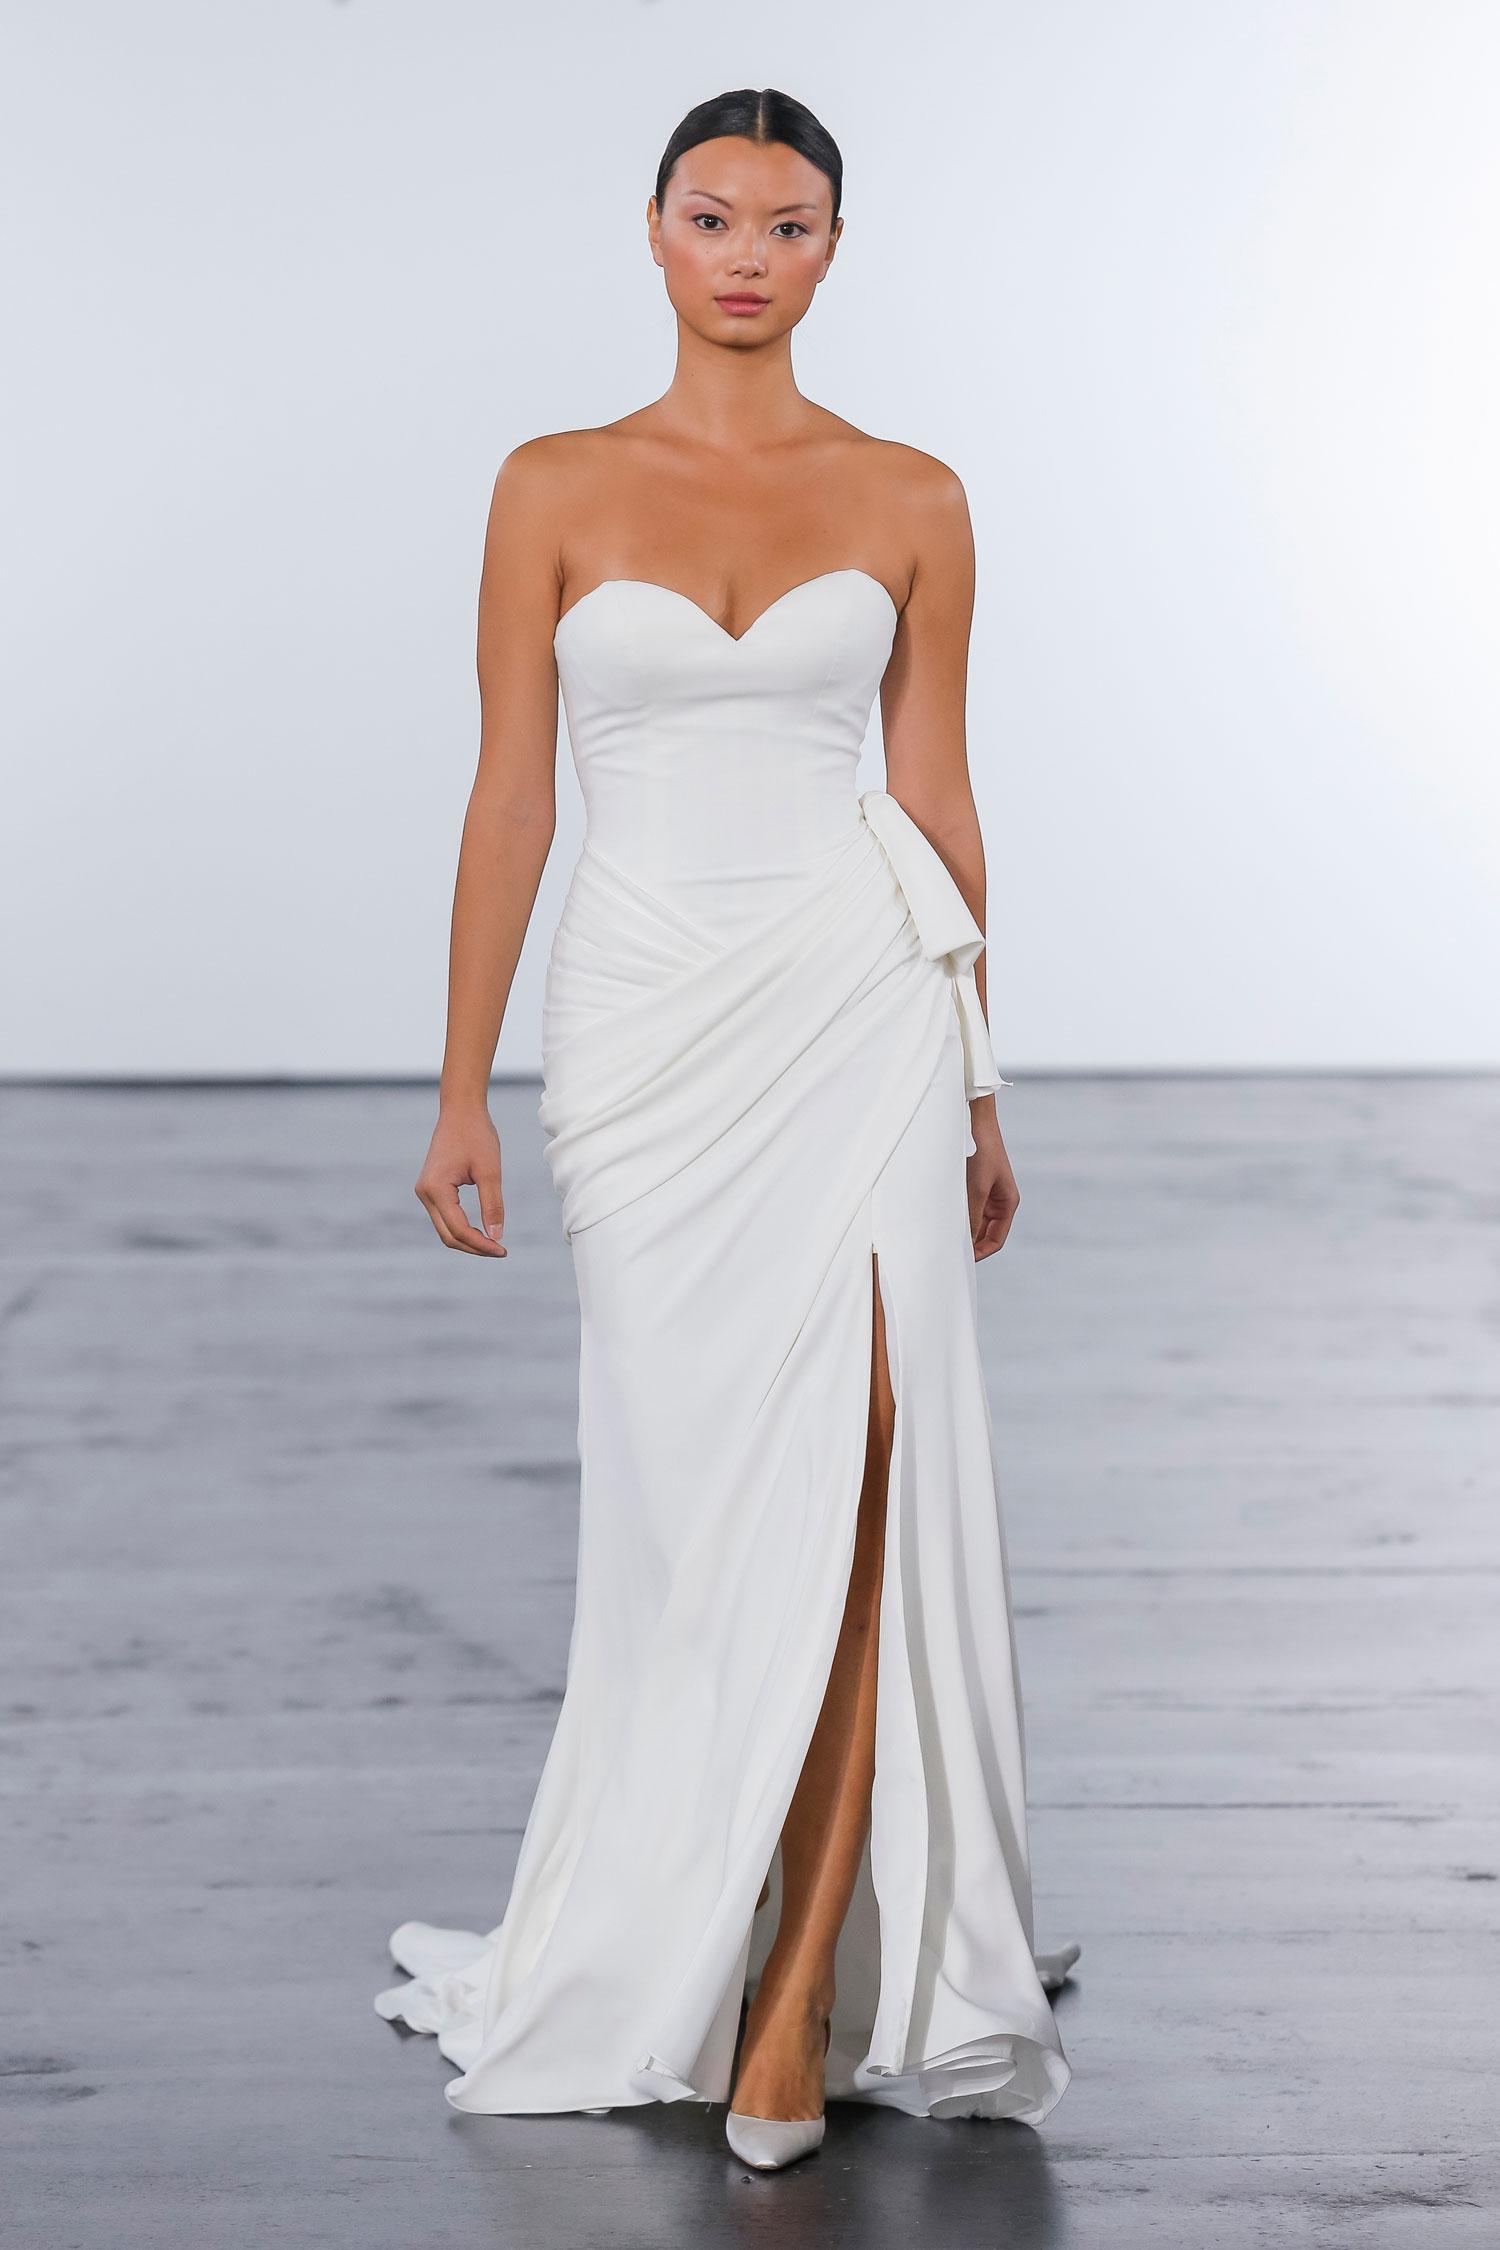 Sweetheart neckline sleek wedding dress with high slit dennis basso for kleinfeld bridal